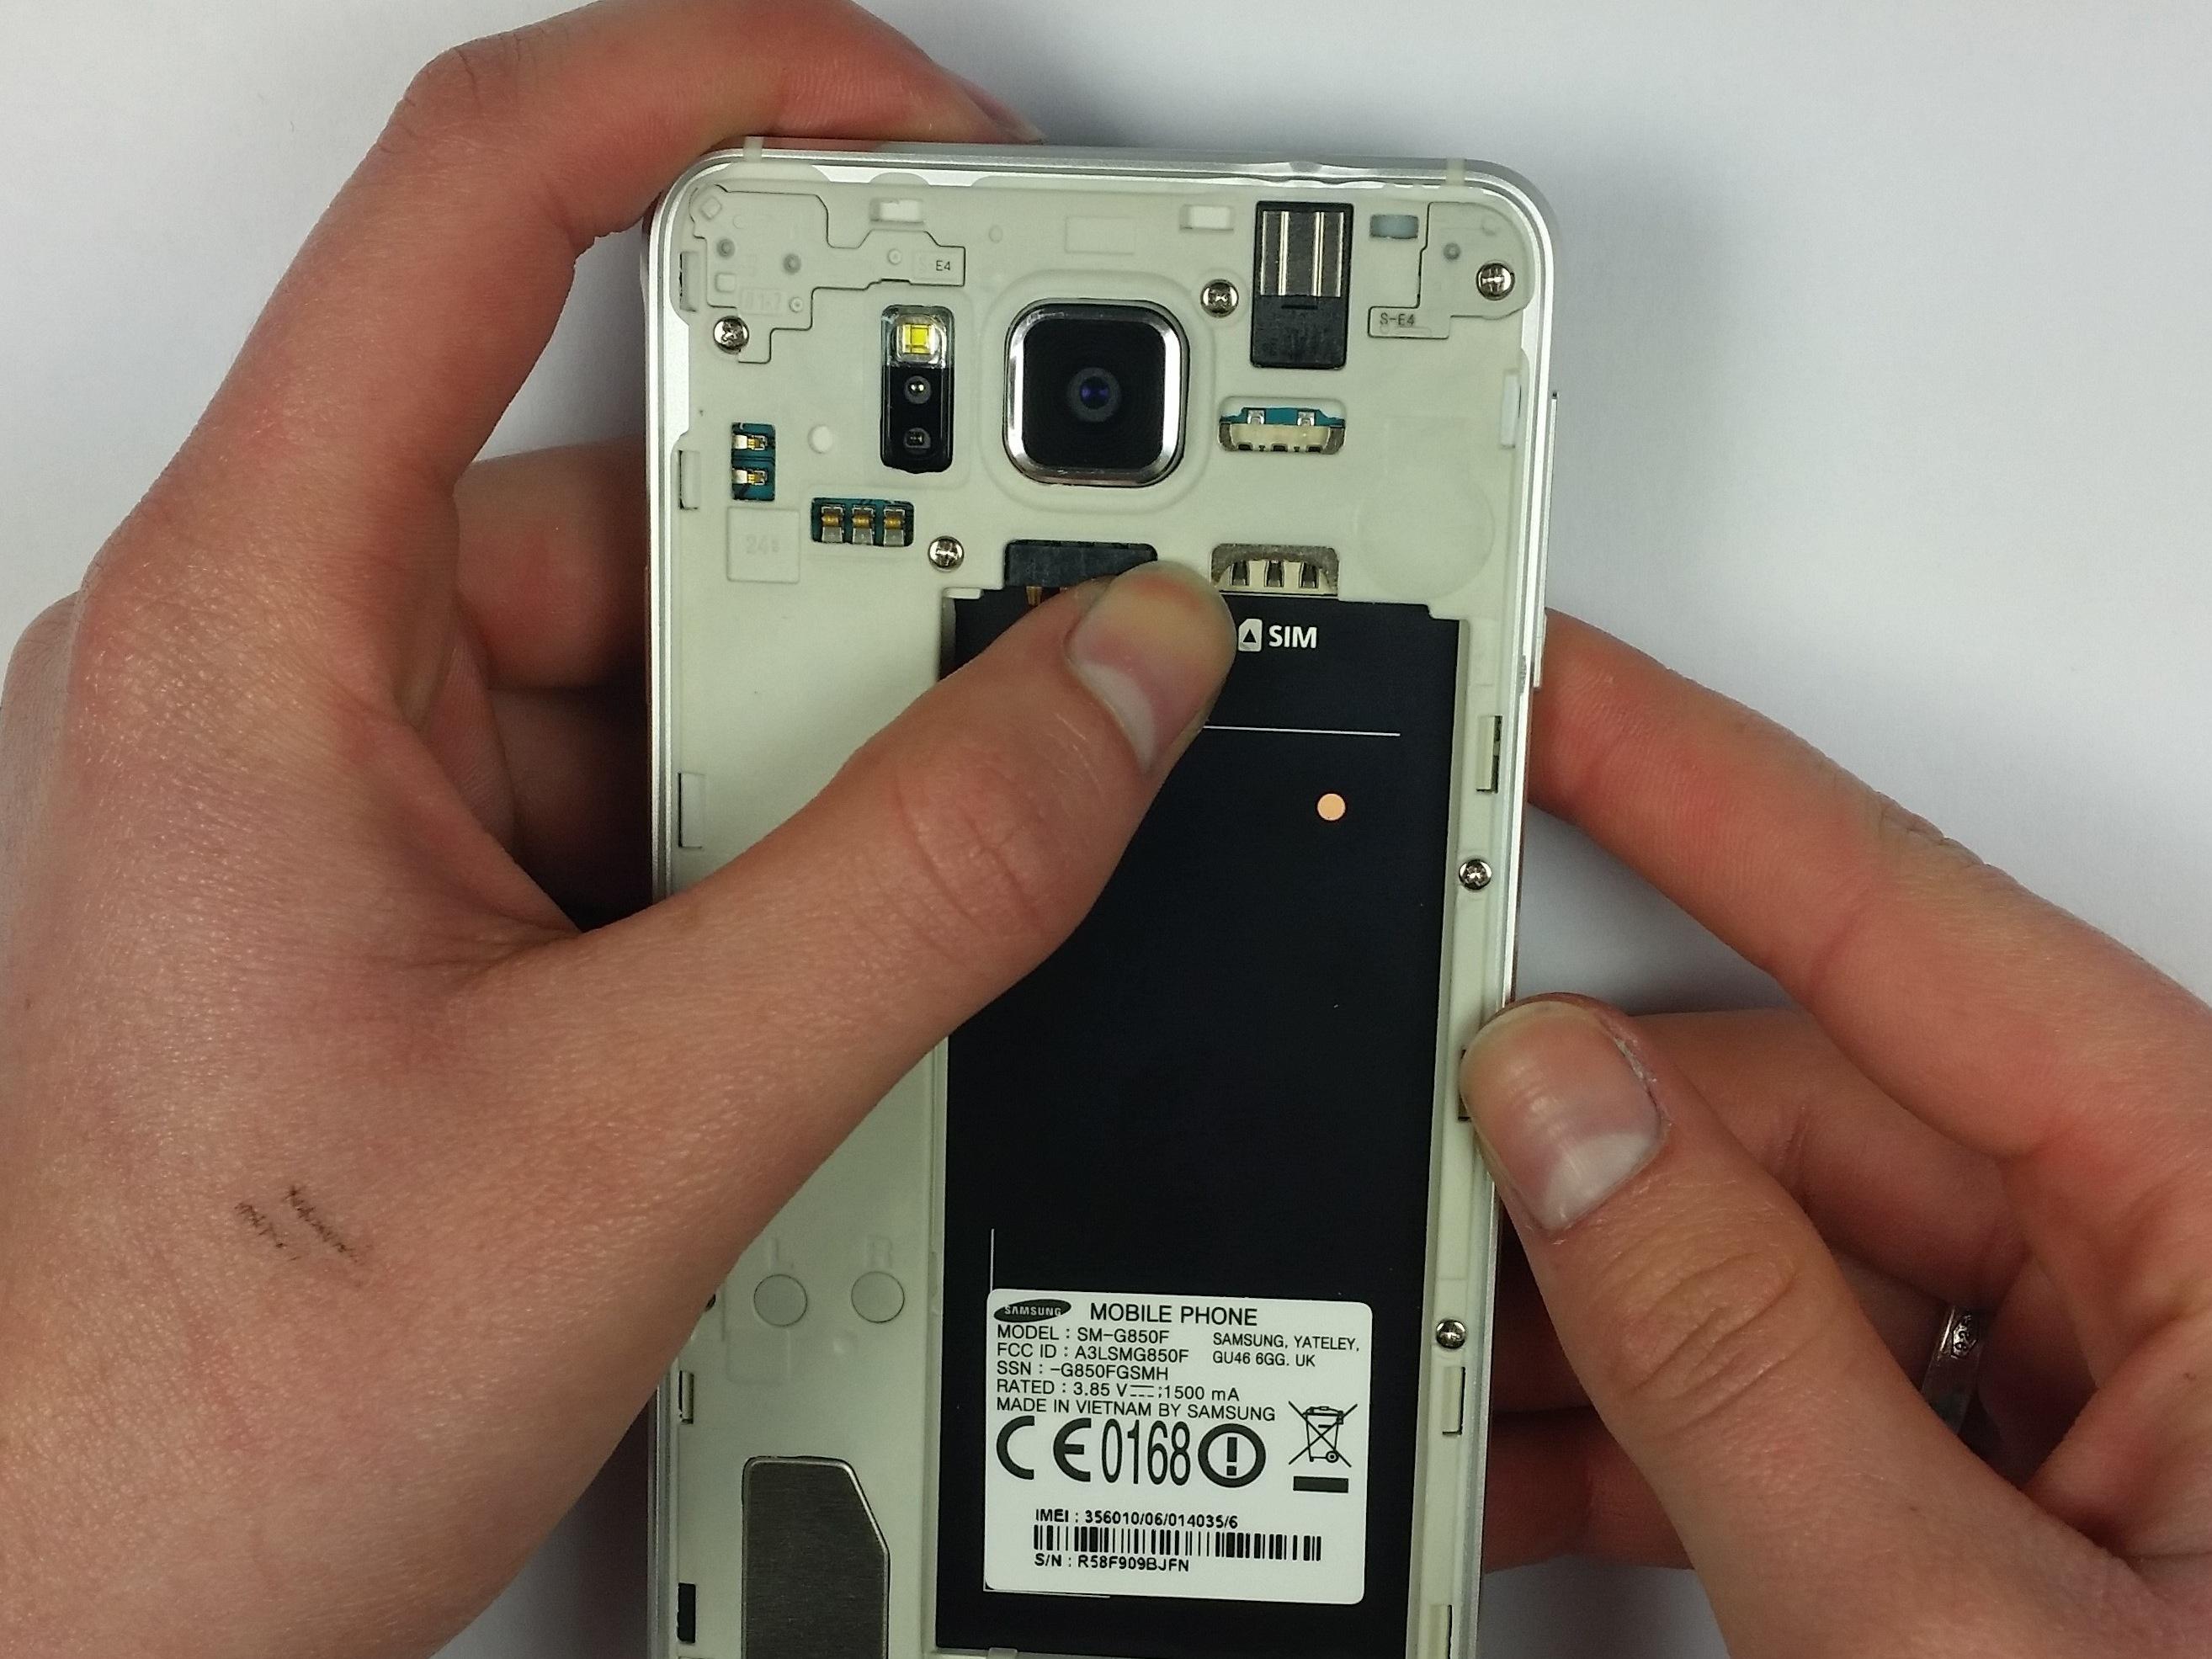 Samsung galaxy alpha sim card slot patin a roulette pas cher fille